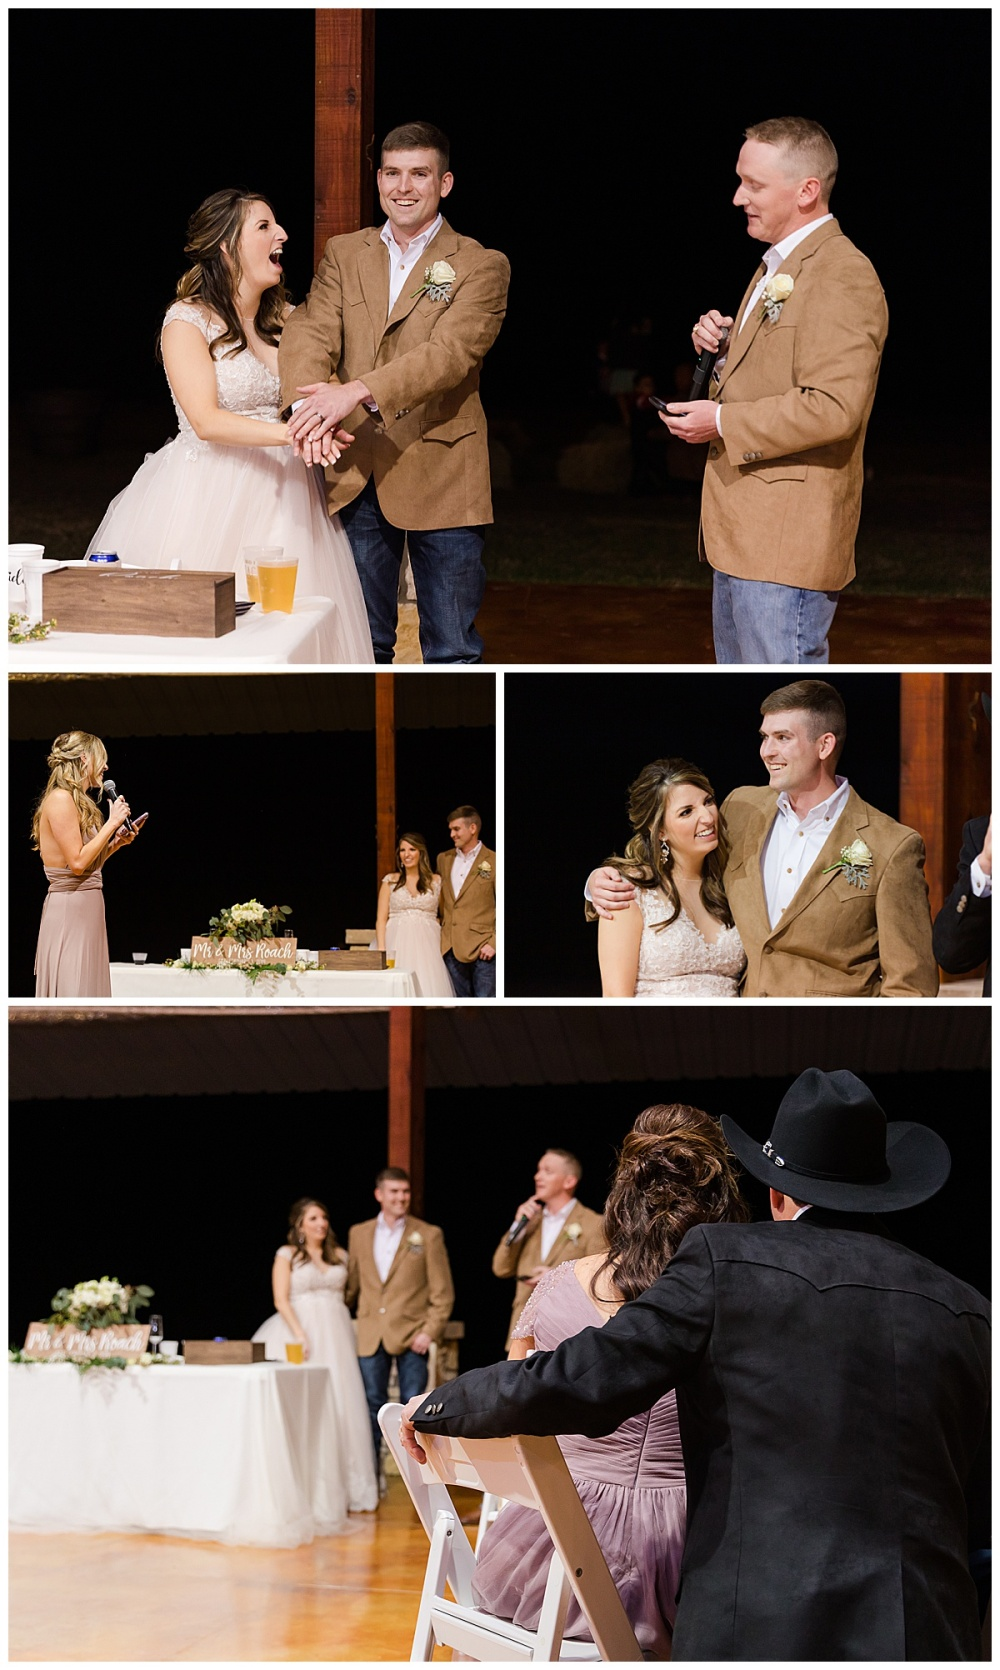 Wedding-Photographer-Texas-Hill-Country-Happy-H-Ranch-Comfor-Texas-Carly-Barton-Photography_0071.jpg